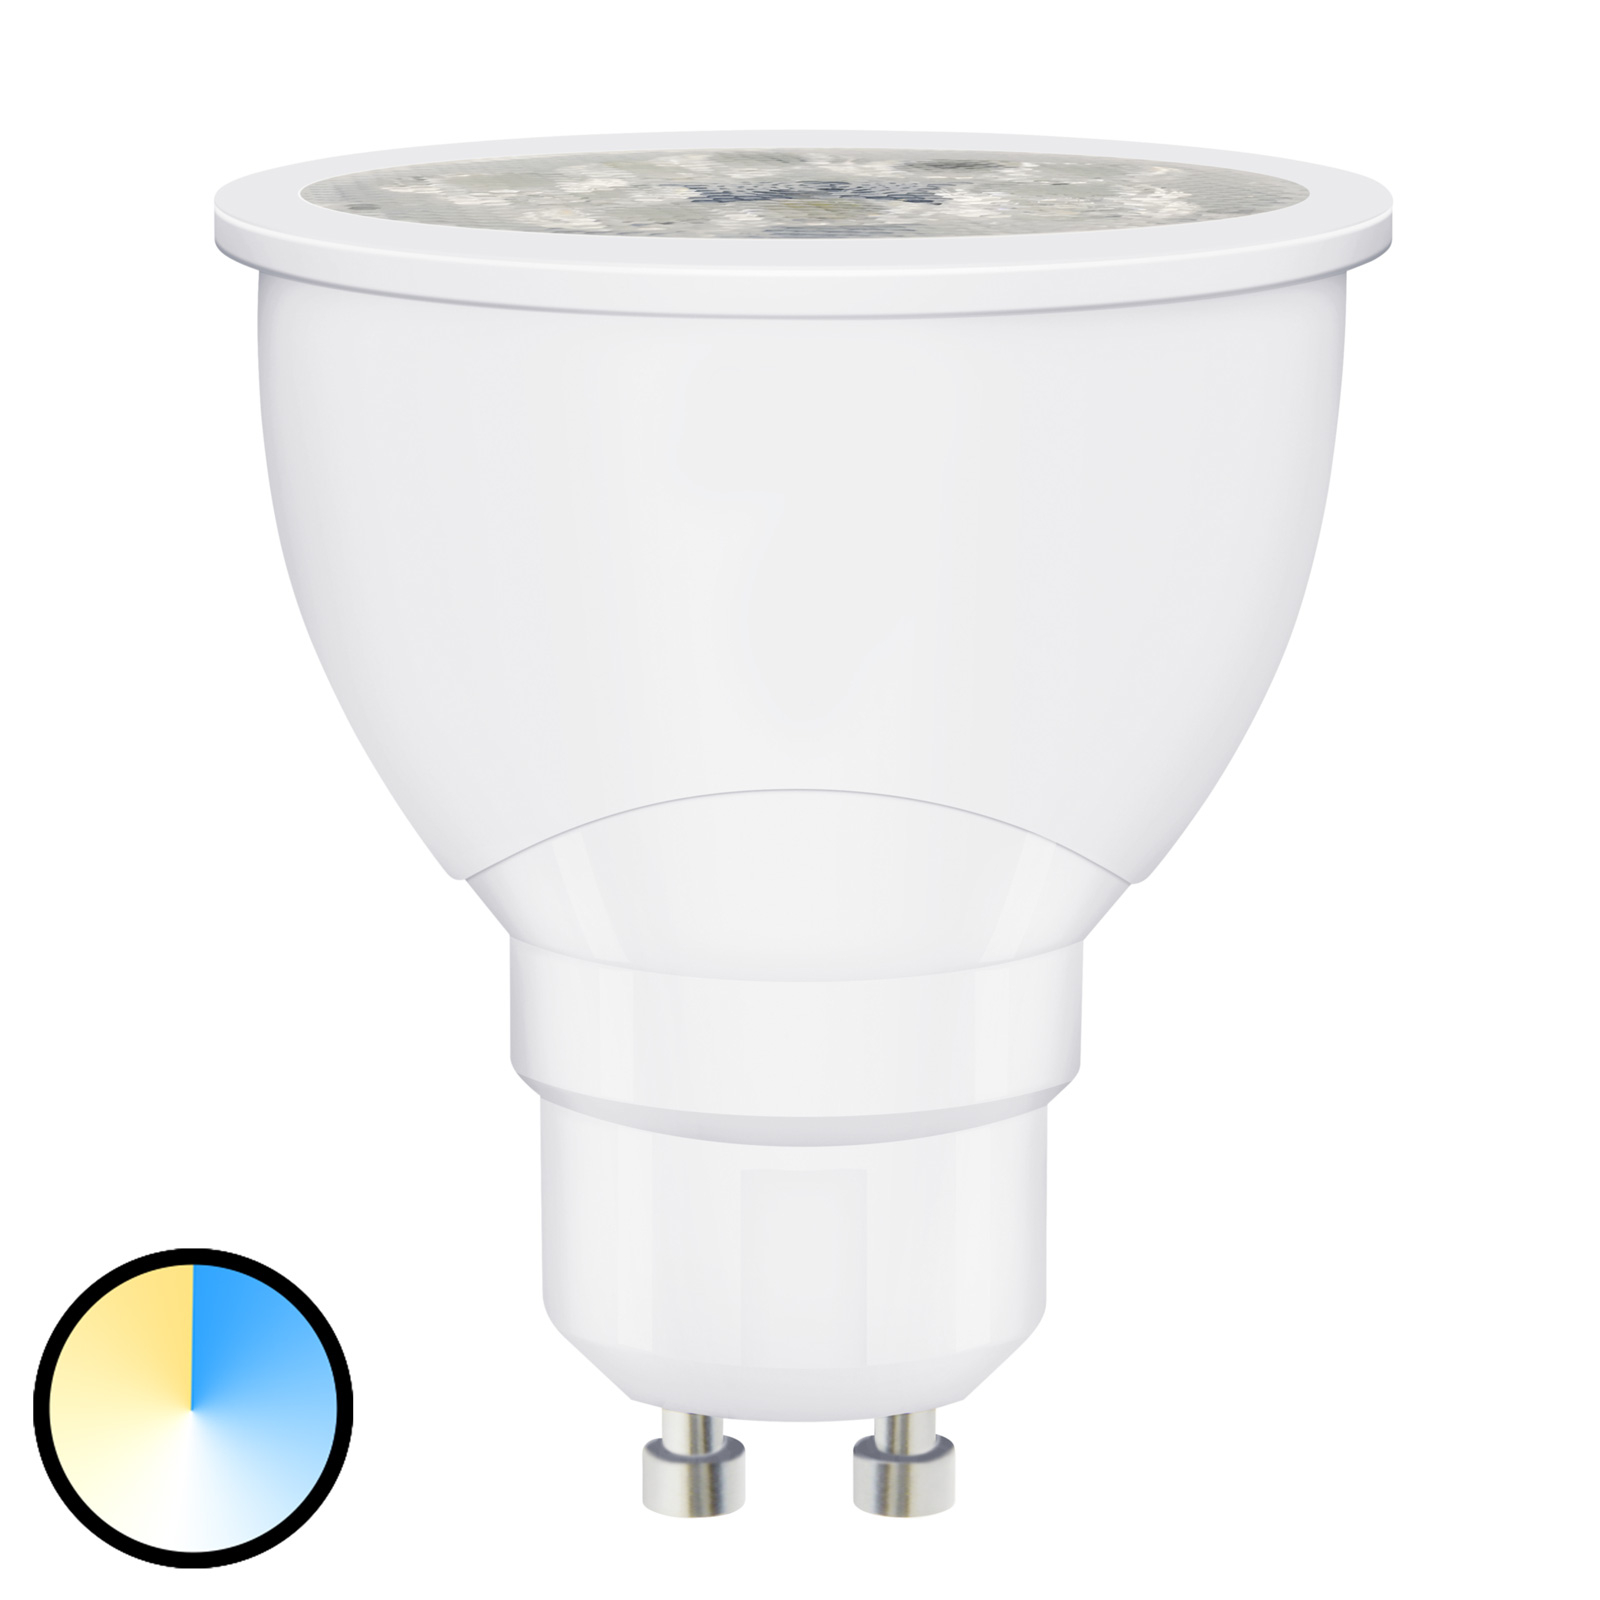 LEDVANCE SMART+ ZigBee GU10 5.5W RGB 2000-6500K_6106200_1